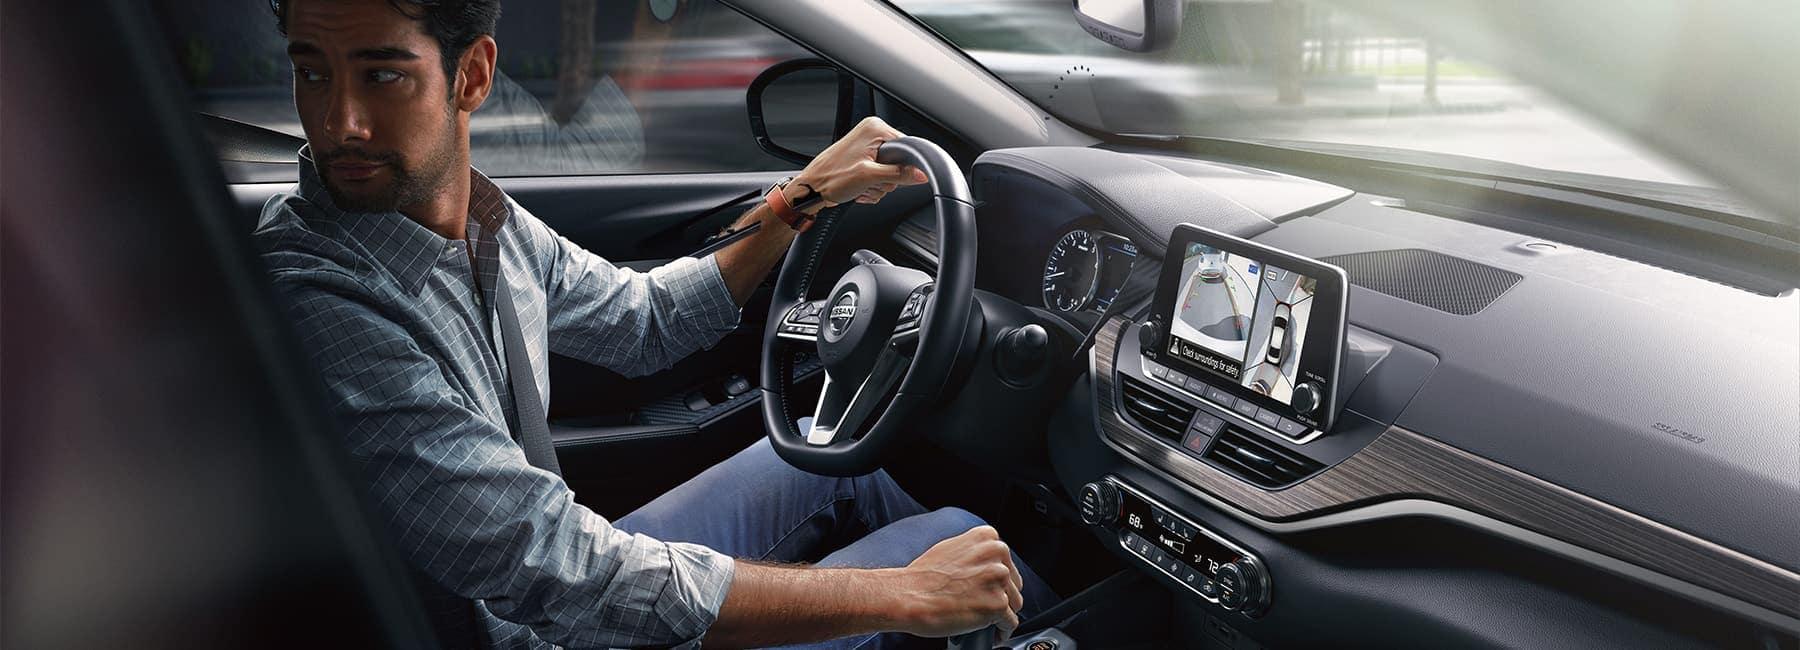 2020-nissan-altima-profile-view-driver-banner